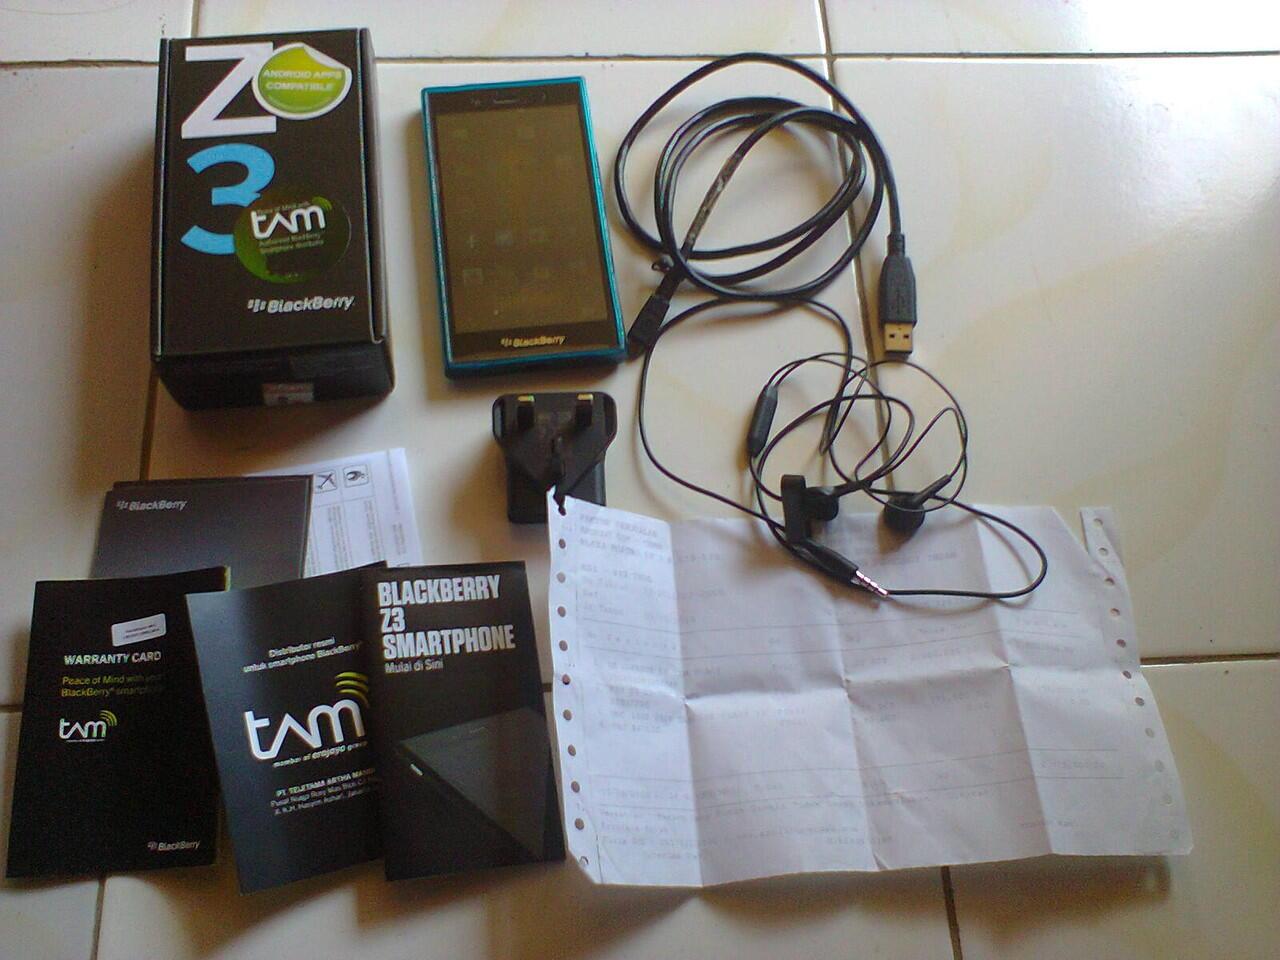 Blackberry Z3 Garansi TAM masih panjang, Surabaya-Kediri. BU